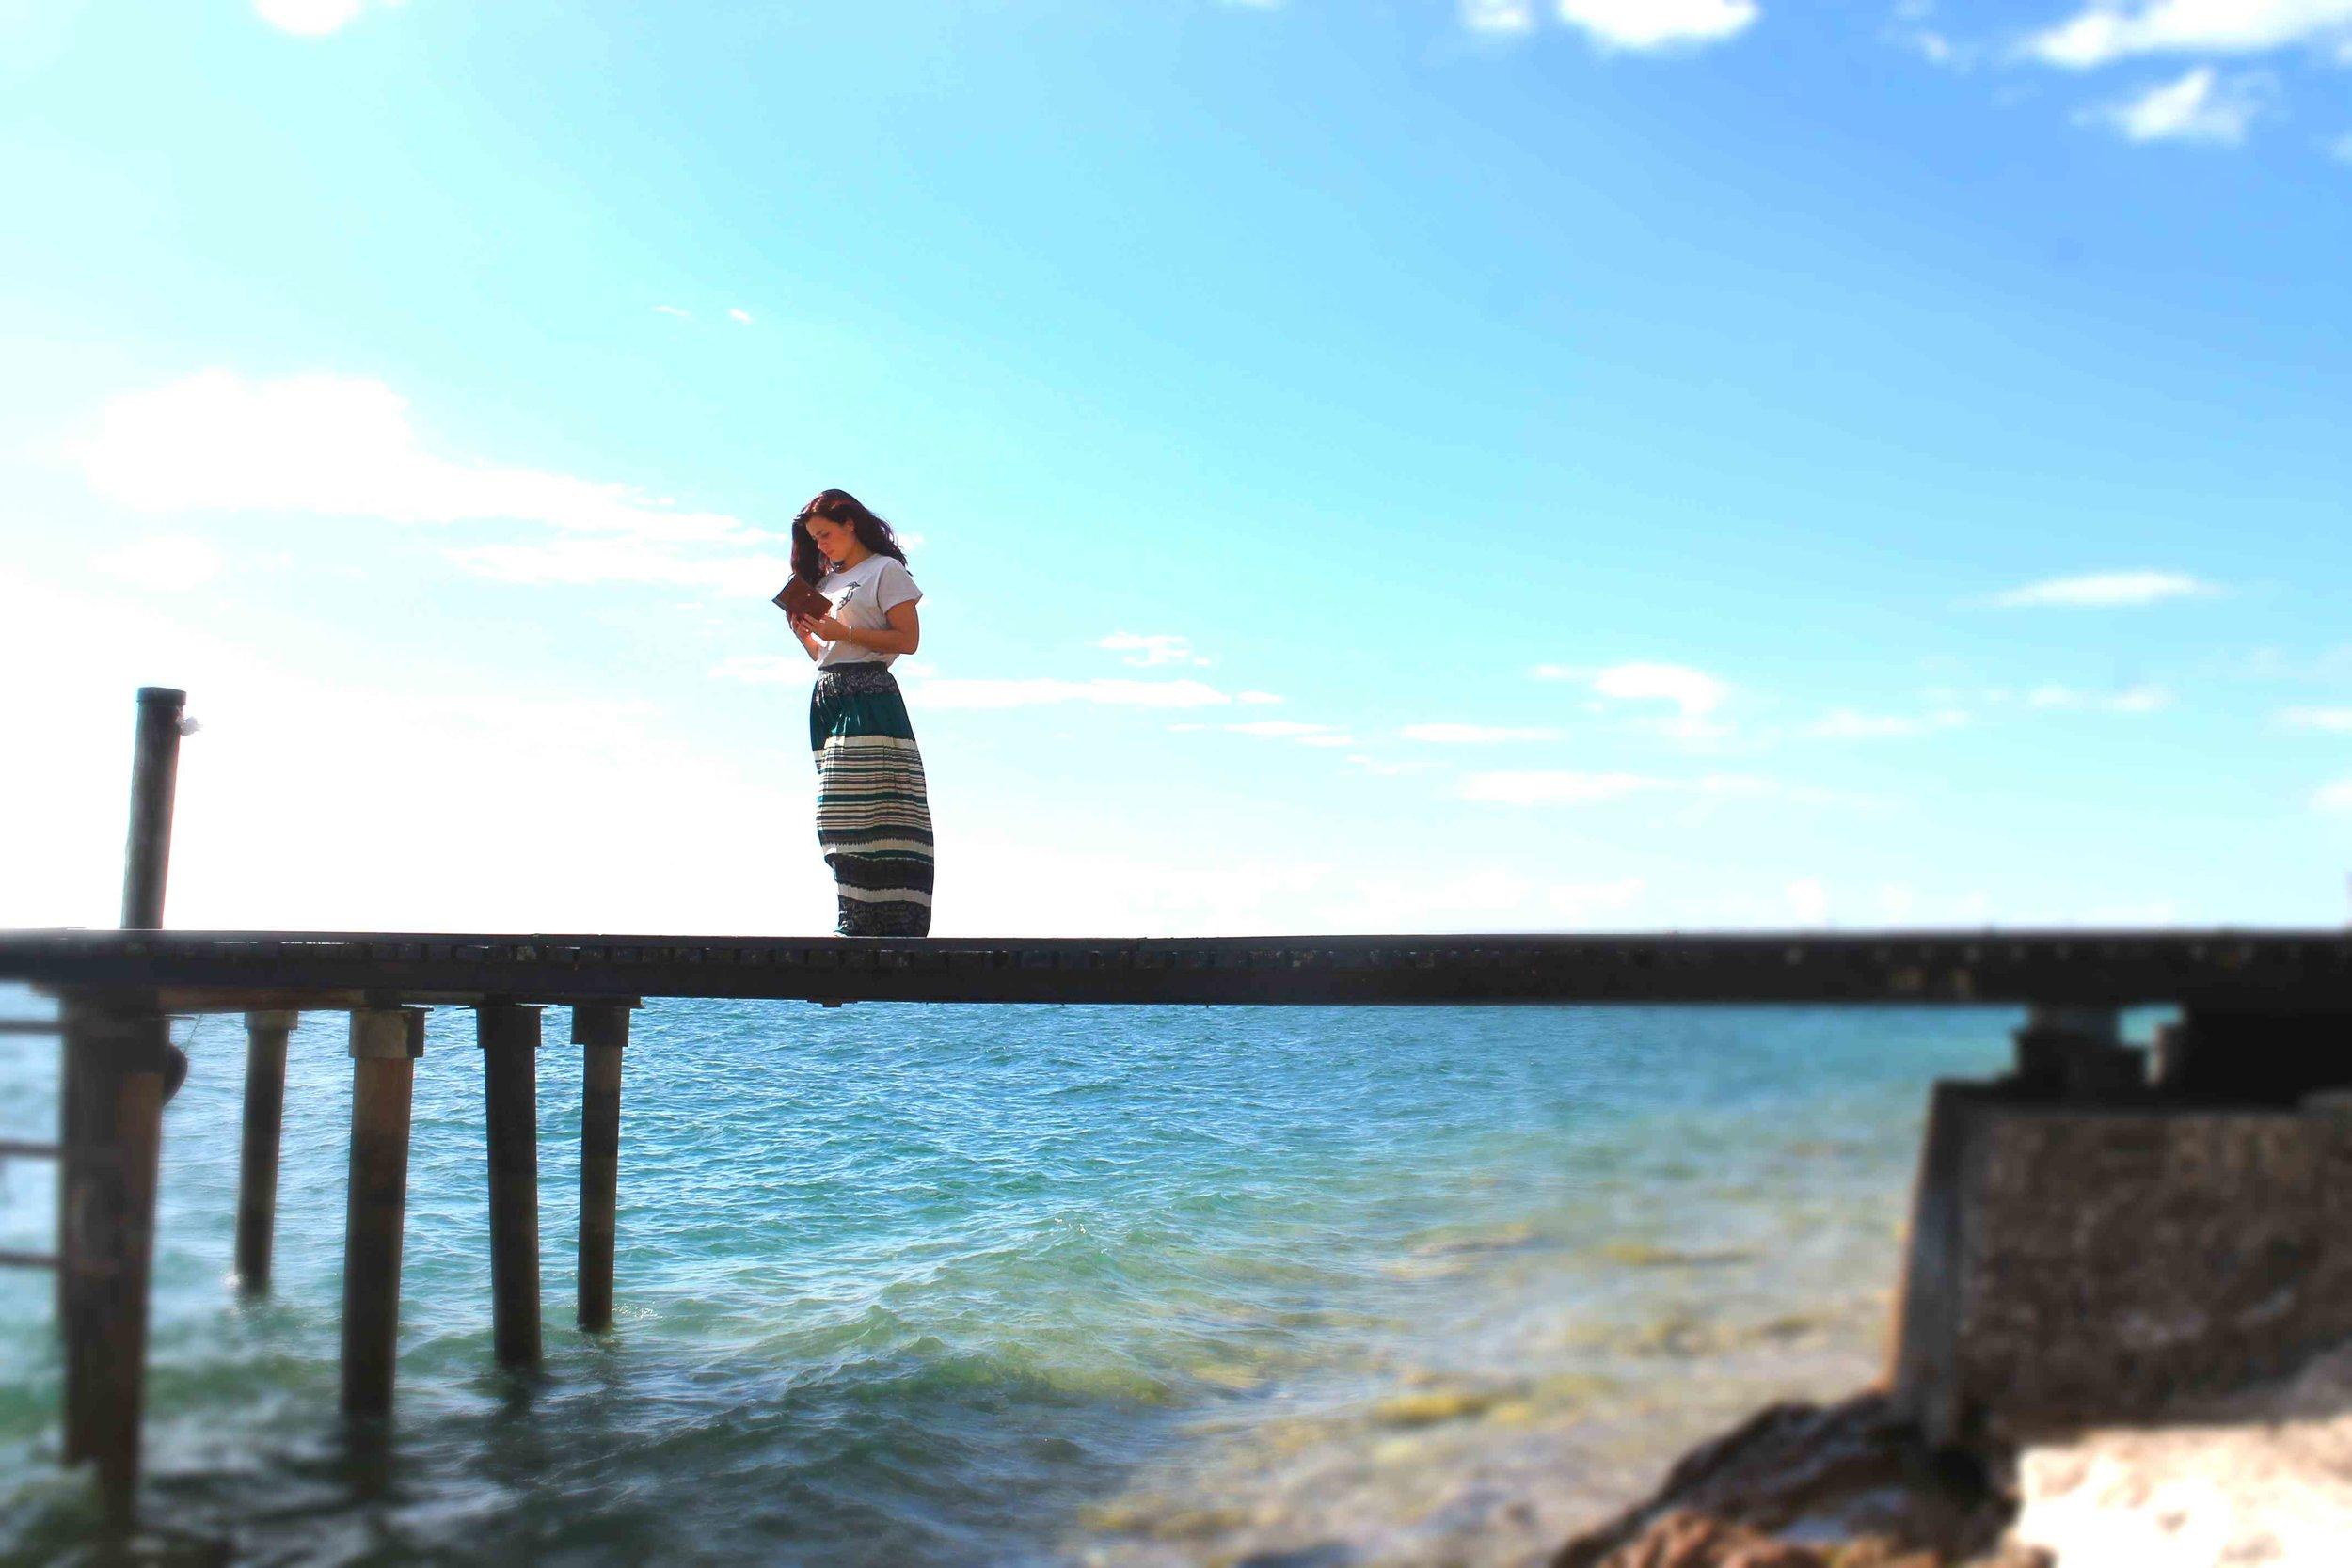 Summer 5 #statusquoio #cuoio #lake #notebook #wave.jpg